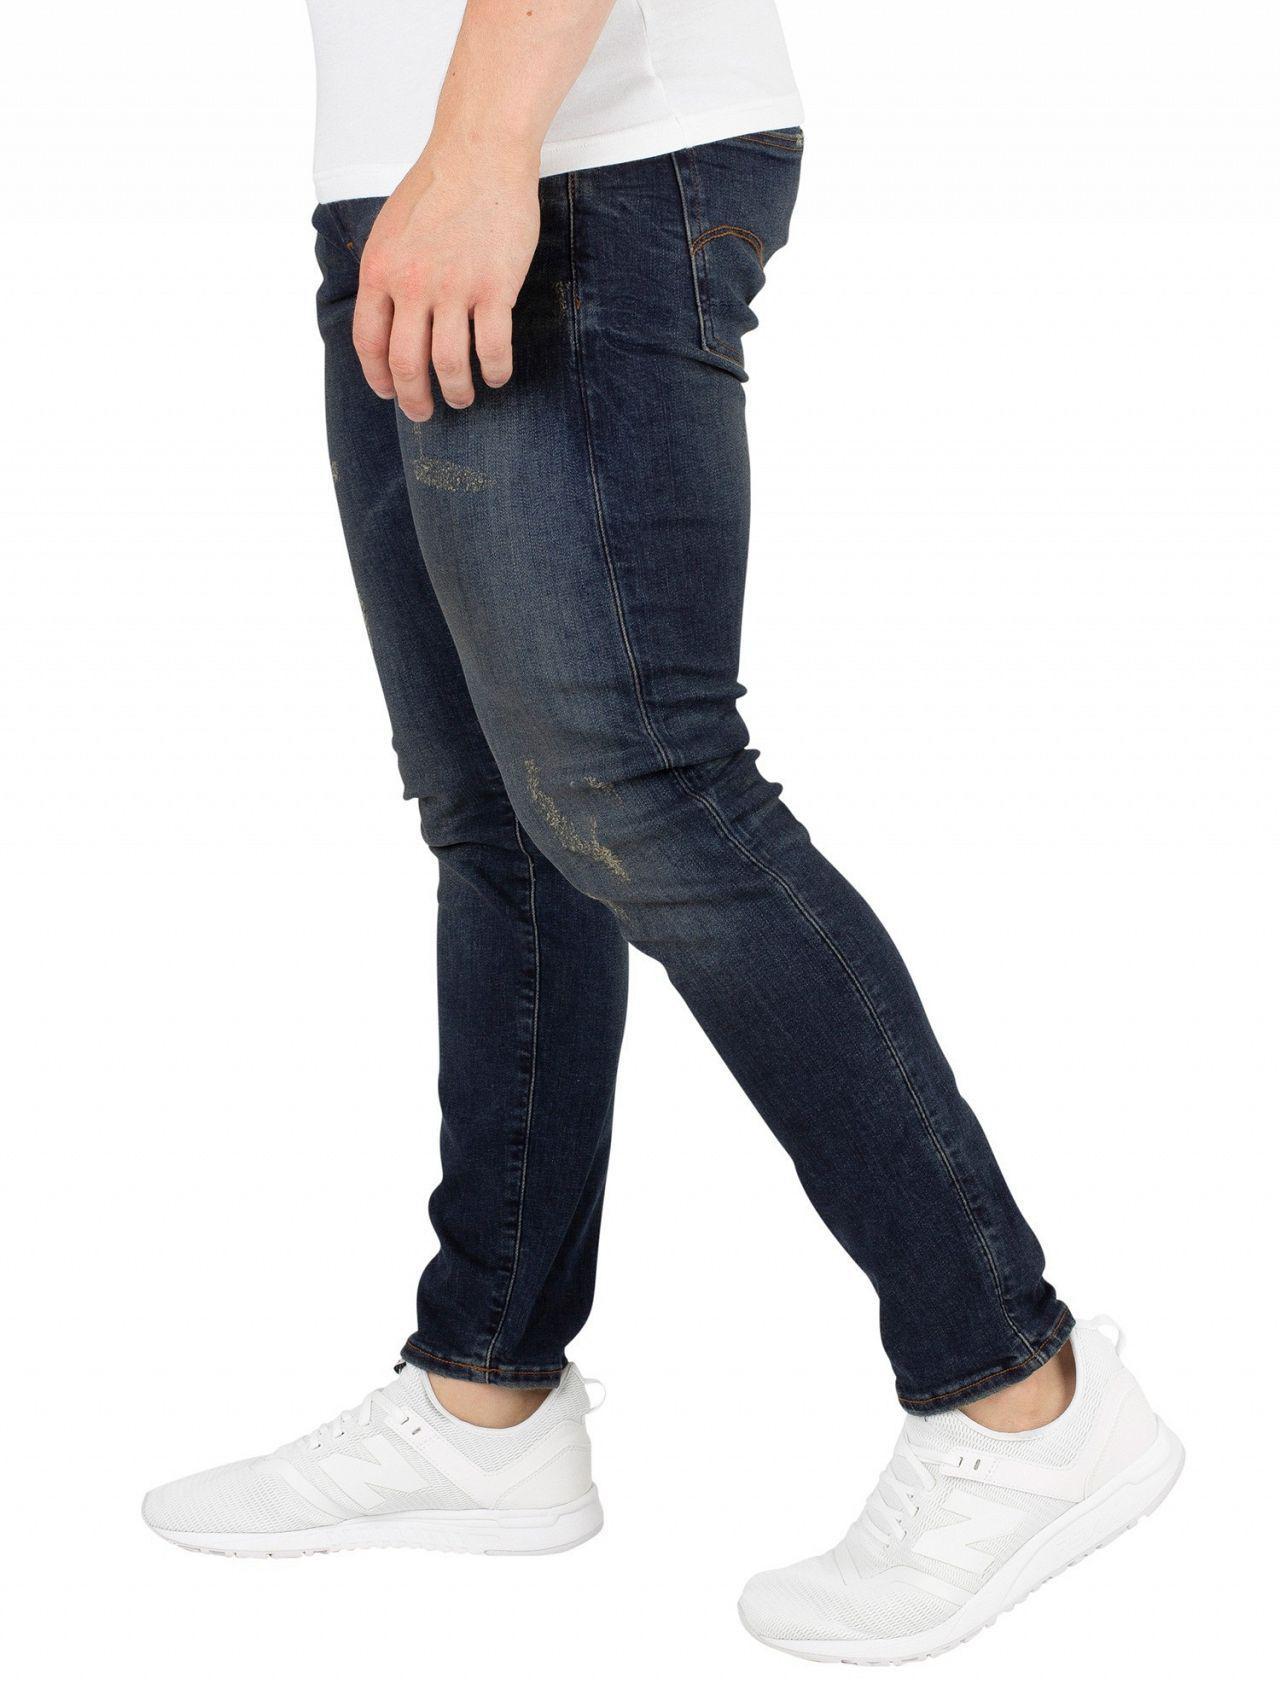 4a0382bd1c5 G-Star RAW Dark Aged Antic Destroy 3301 Deconstructed Skinny Jeans ...